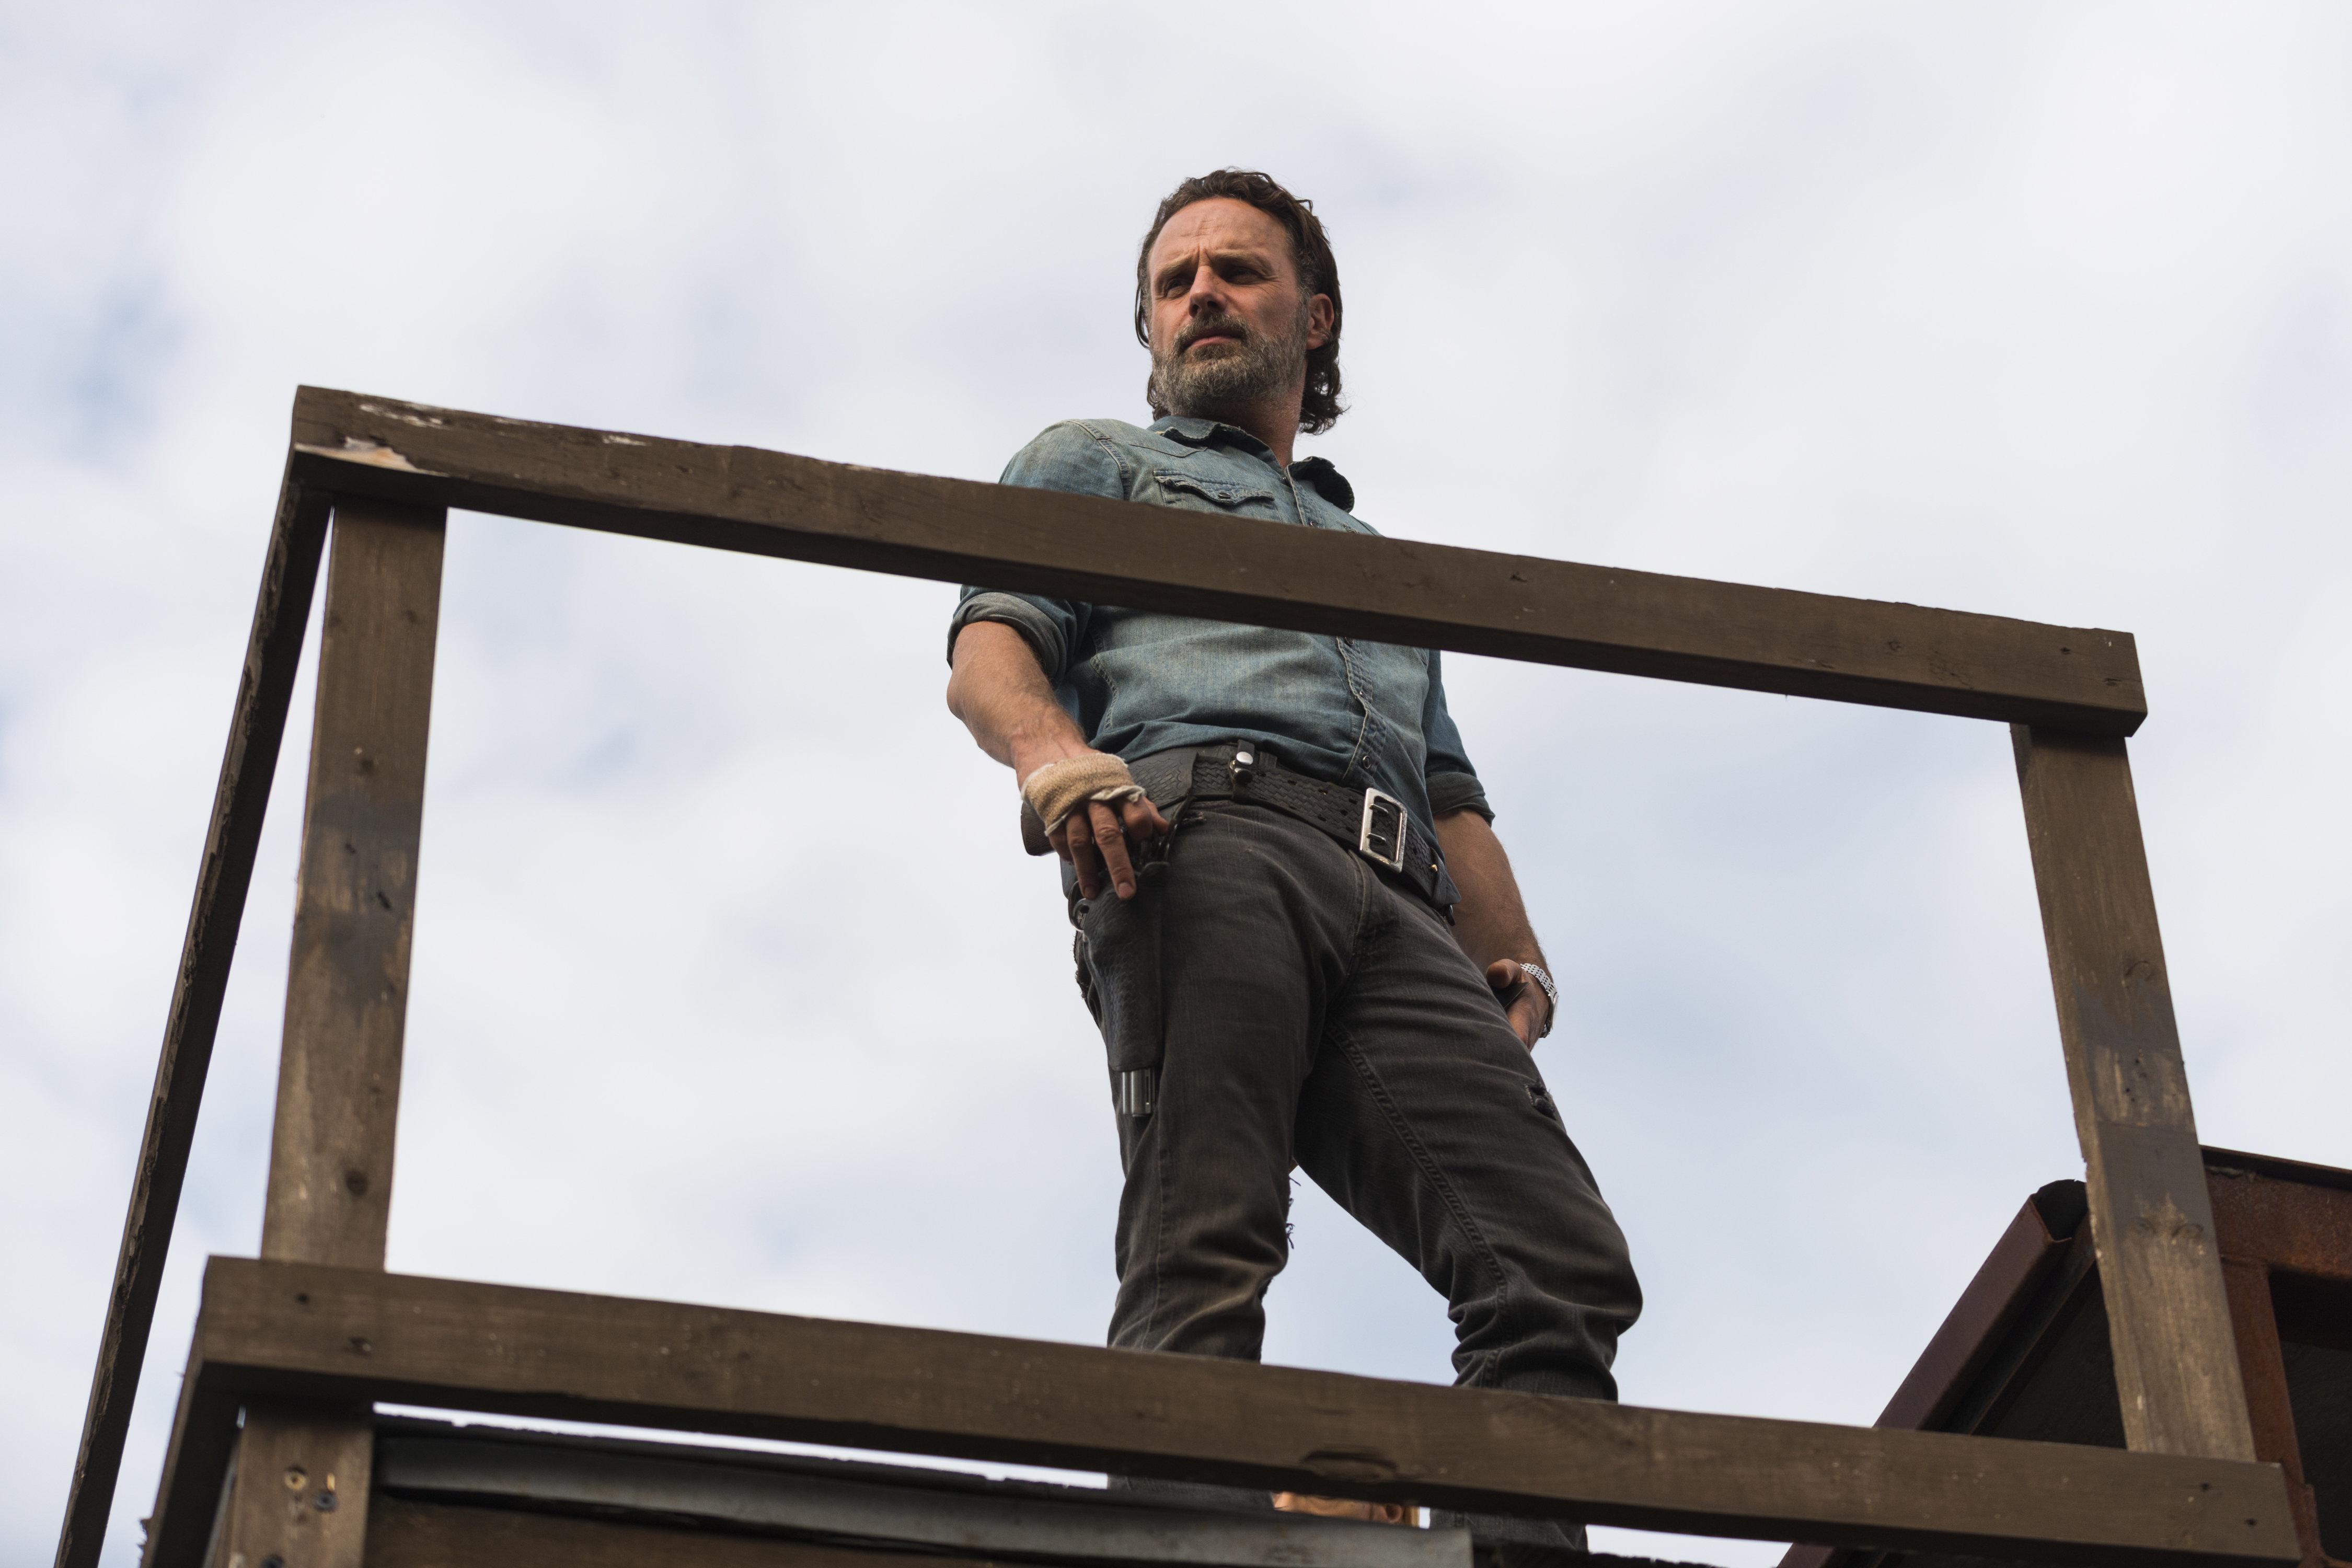 'The Walking Dead' Season 8 Trailer Will Make You 'S**t'